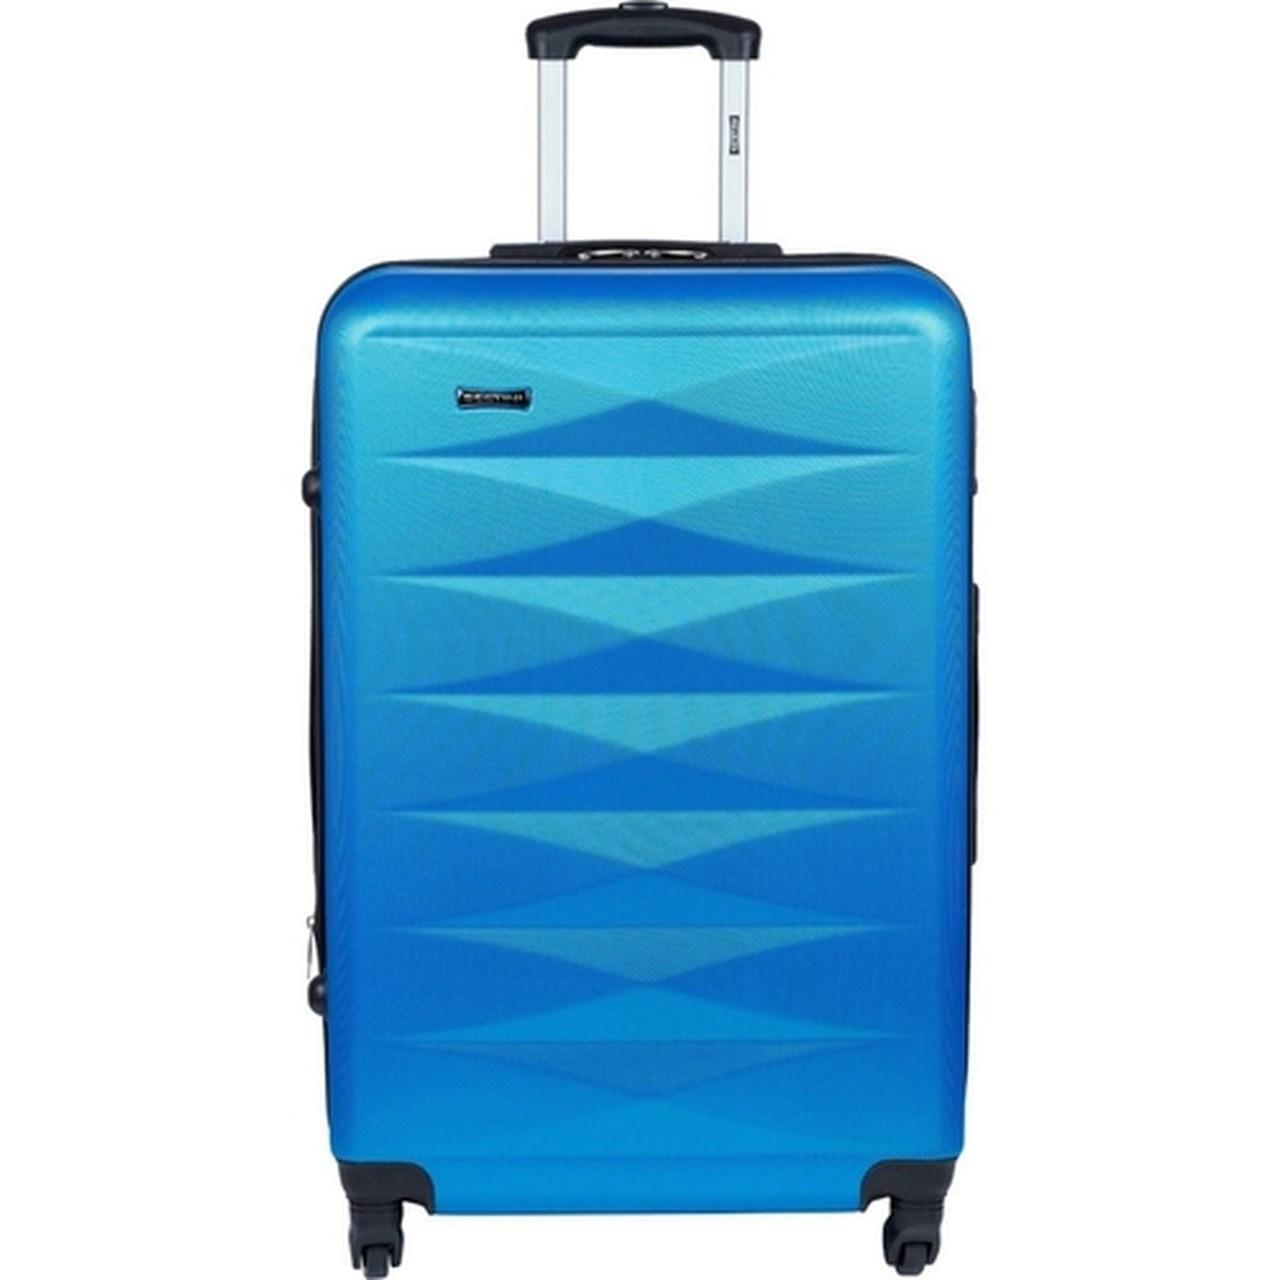 MALA UNISEX SESTINI TSA 4 FUN 3T REF:040690M